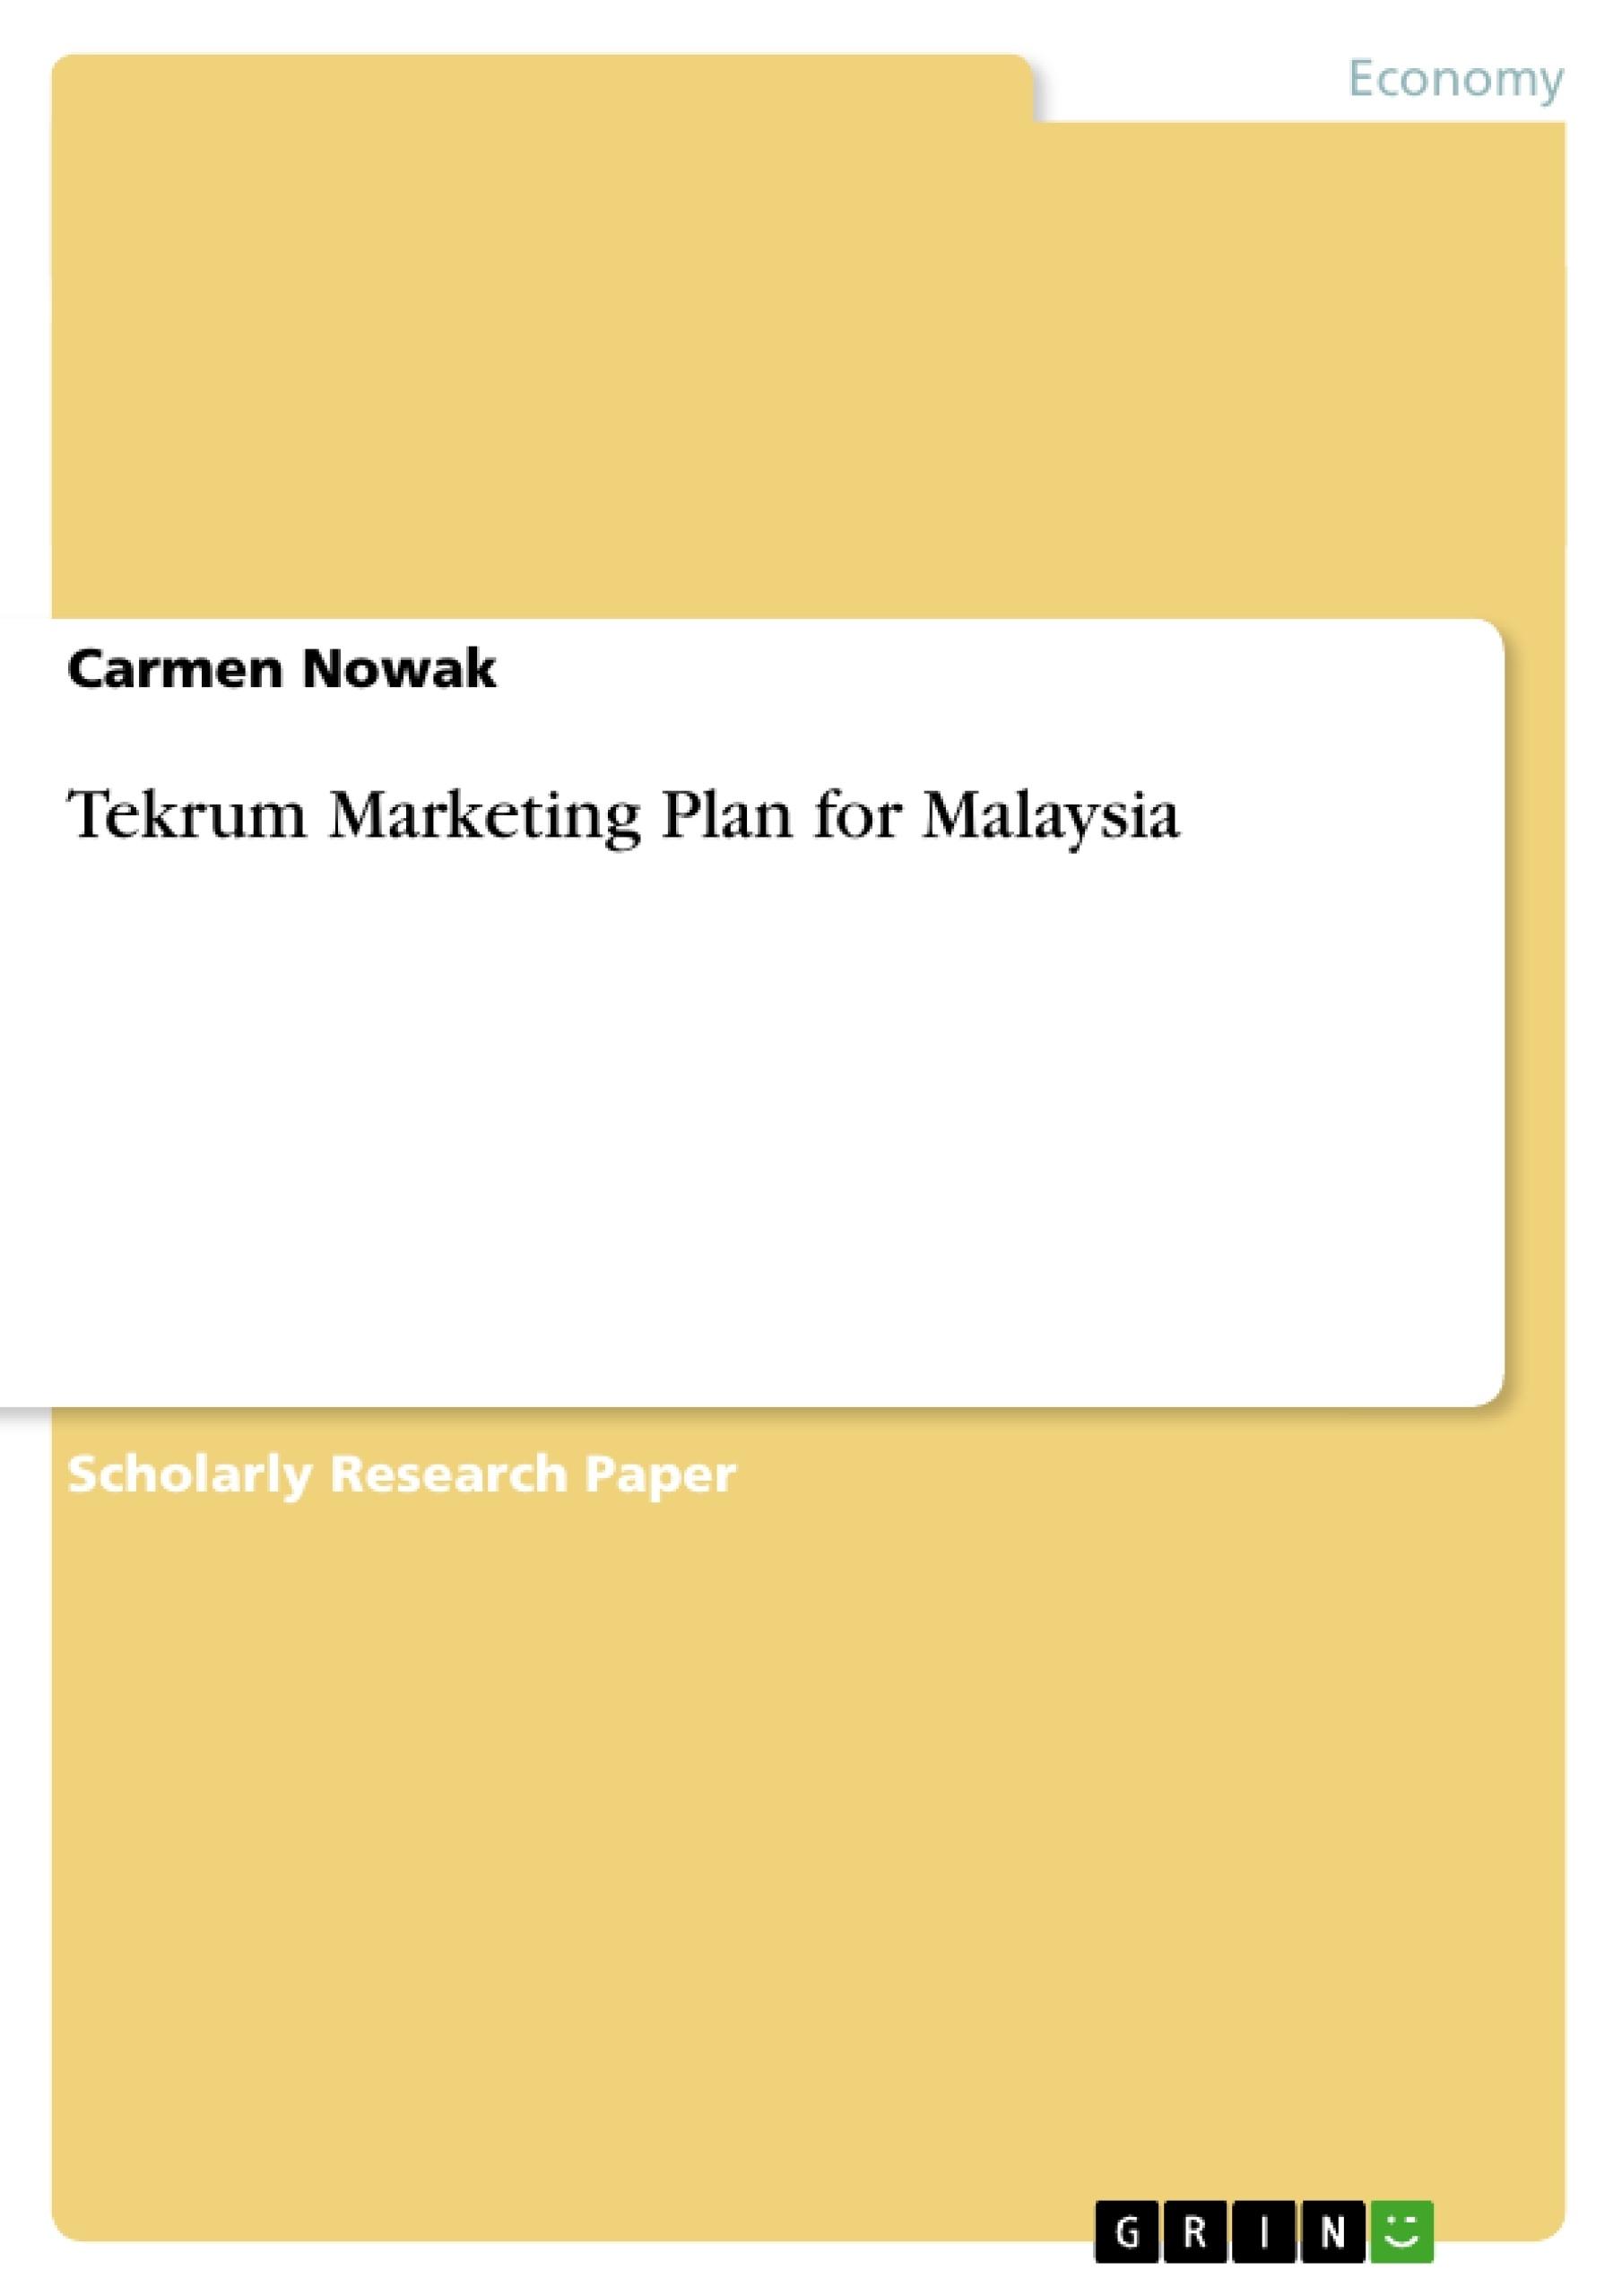 Title: Tekrum Marketing Plan for Malaysia